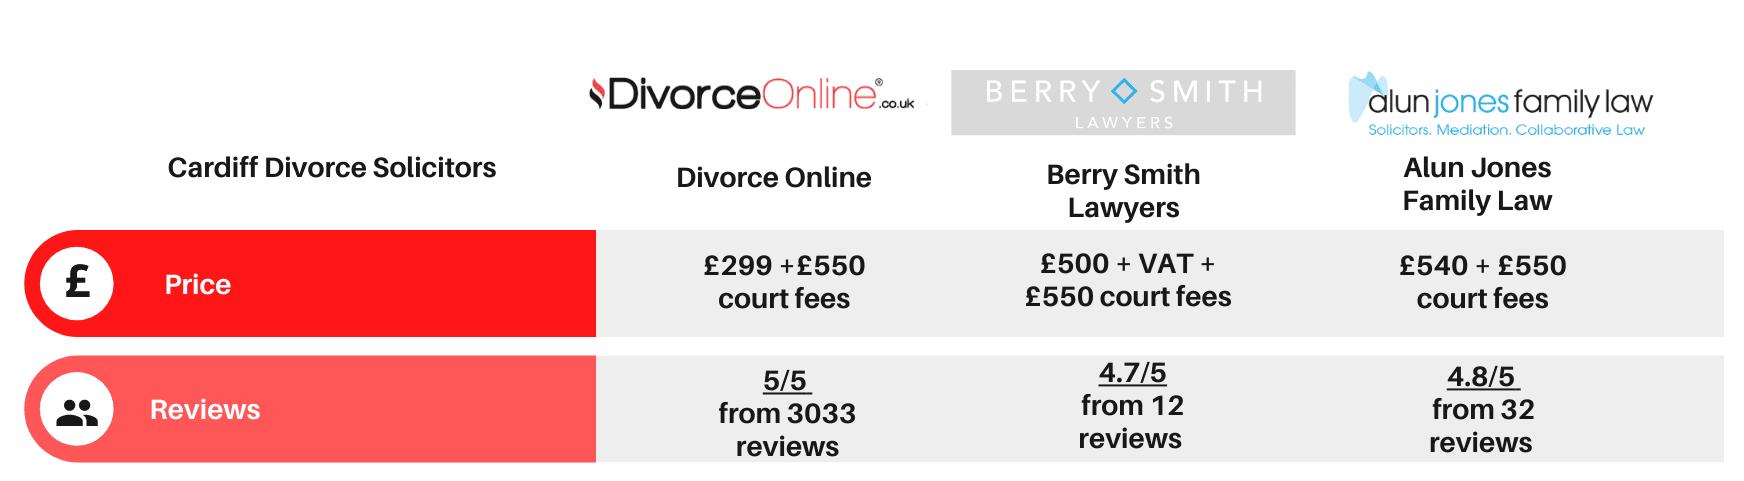 cardiff solicitor divorce comparison table